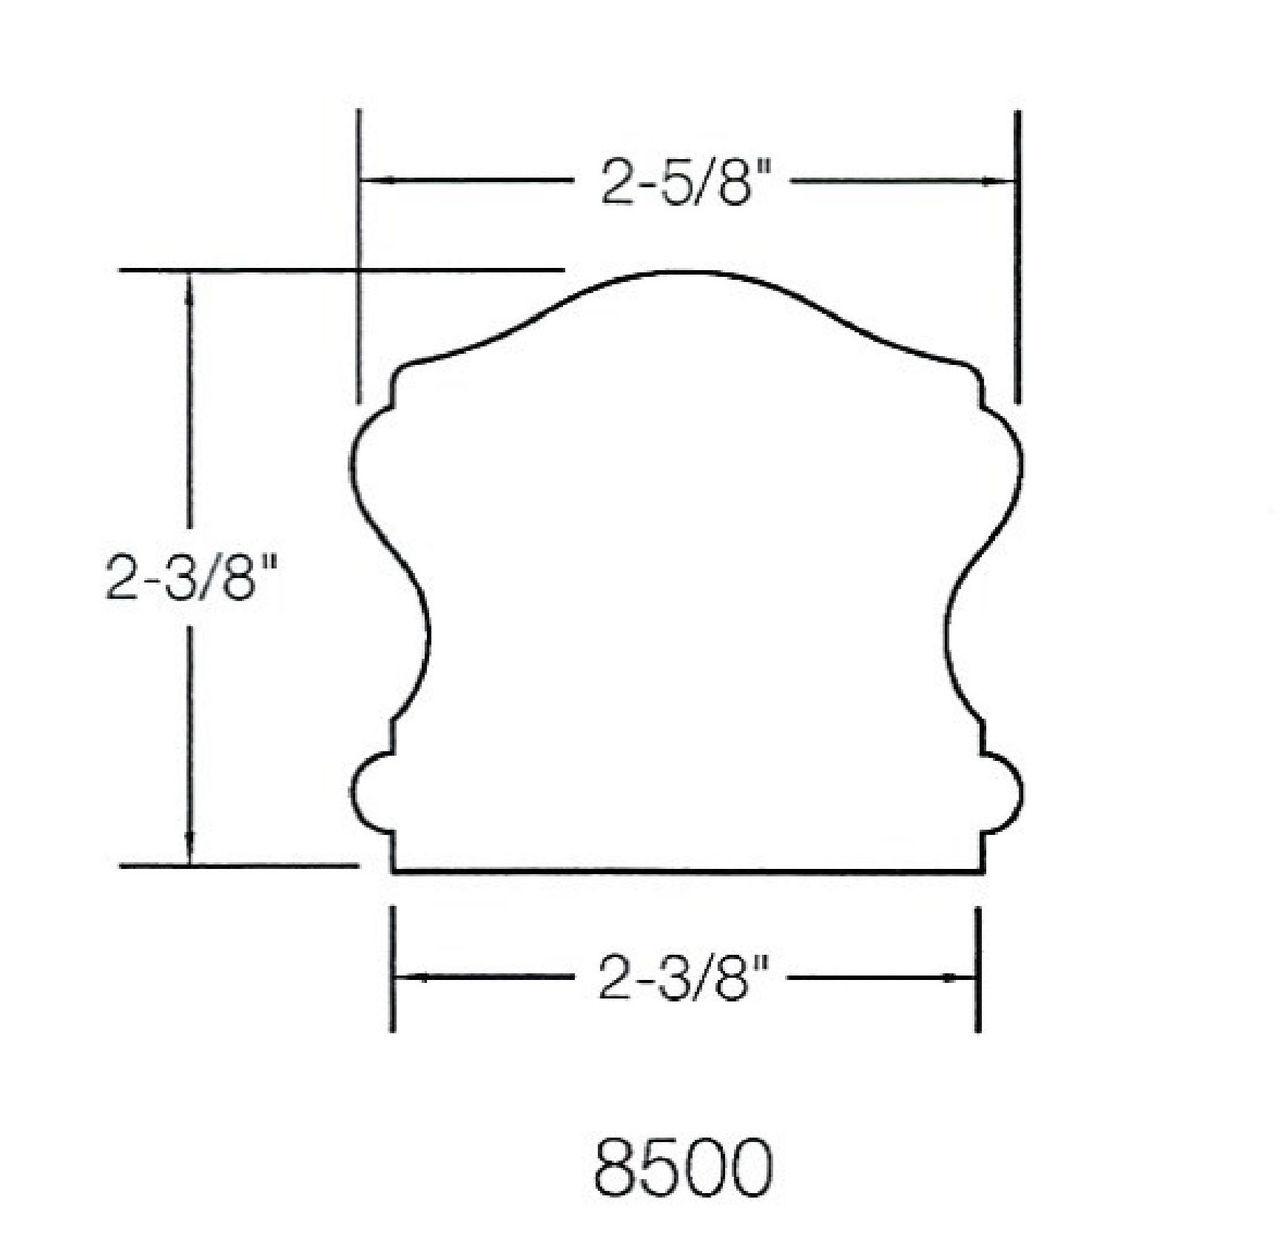 8500 Handrail Dimensional Information